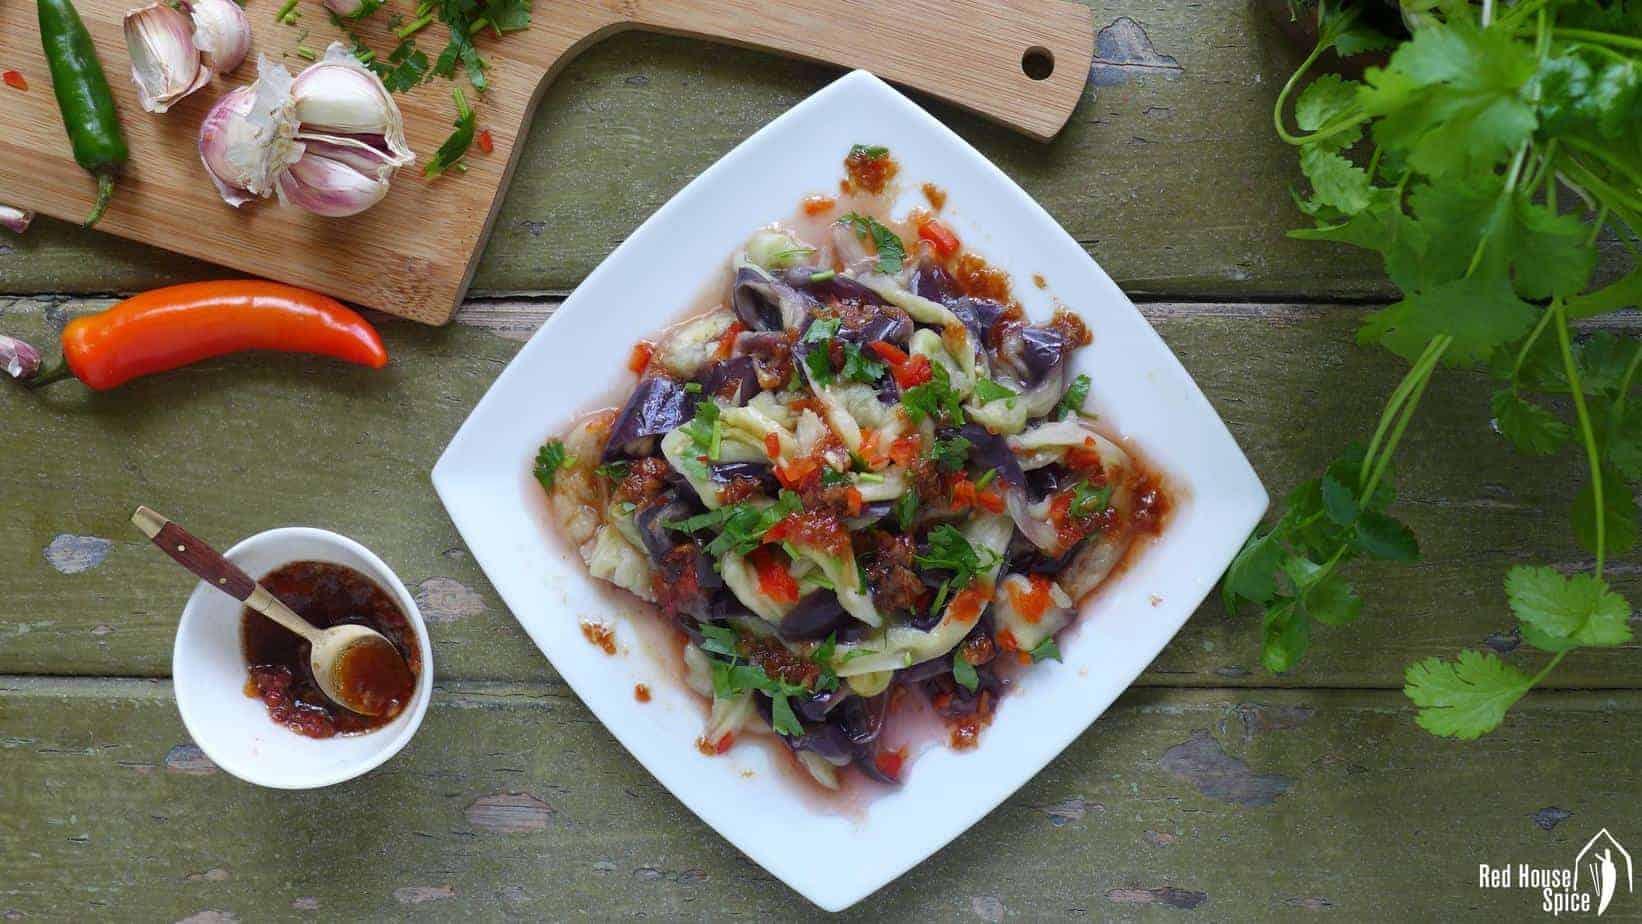 Aubergine salad with chilli-garlic dressing (凉拌茄子)